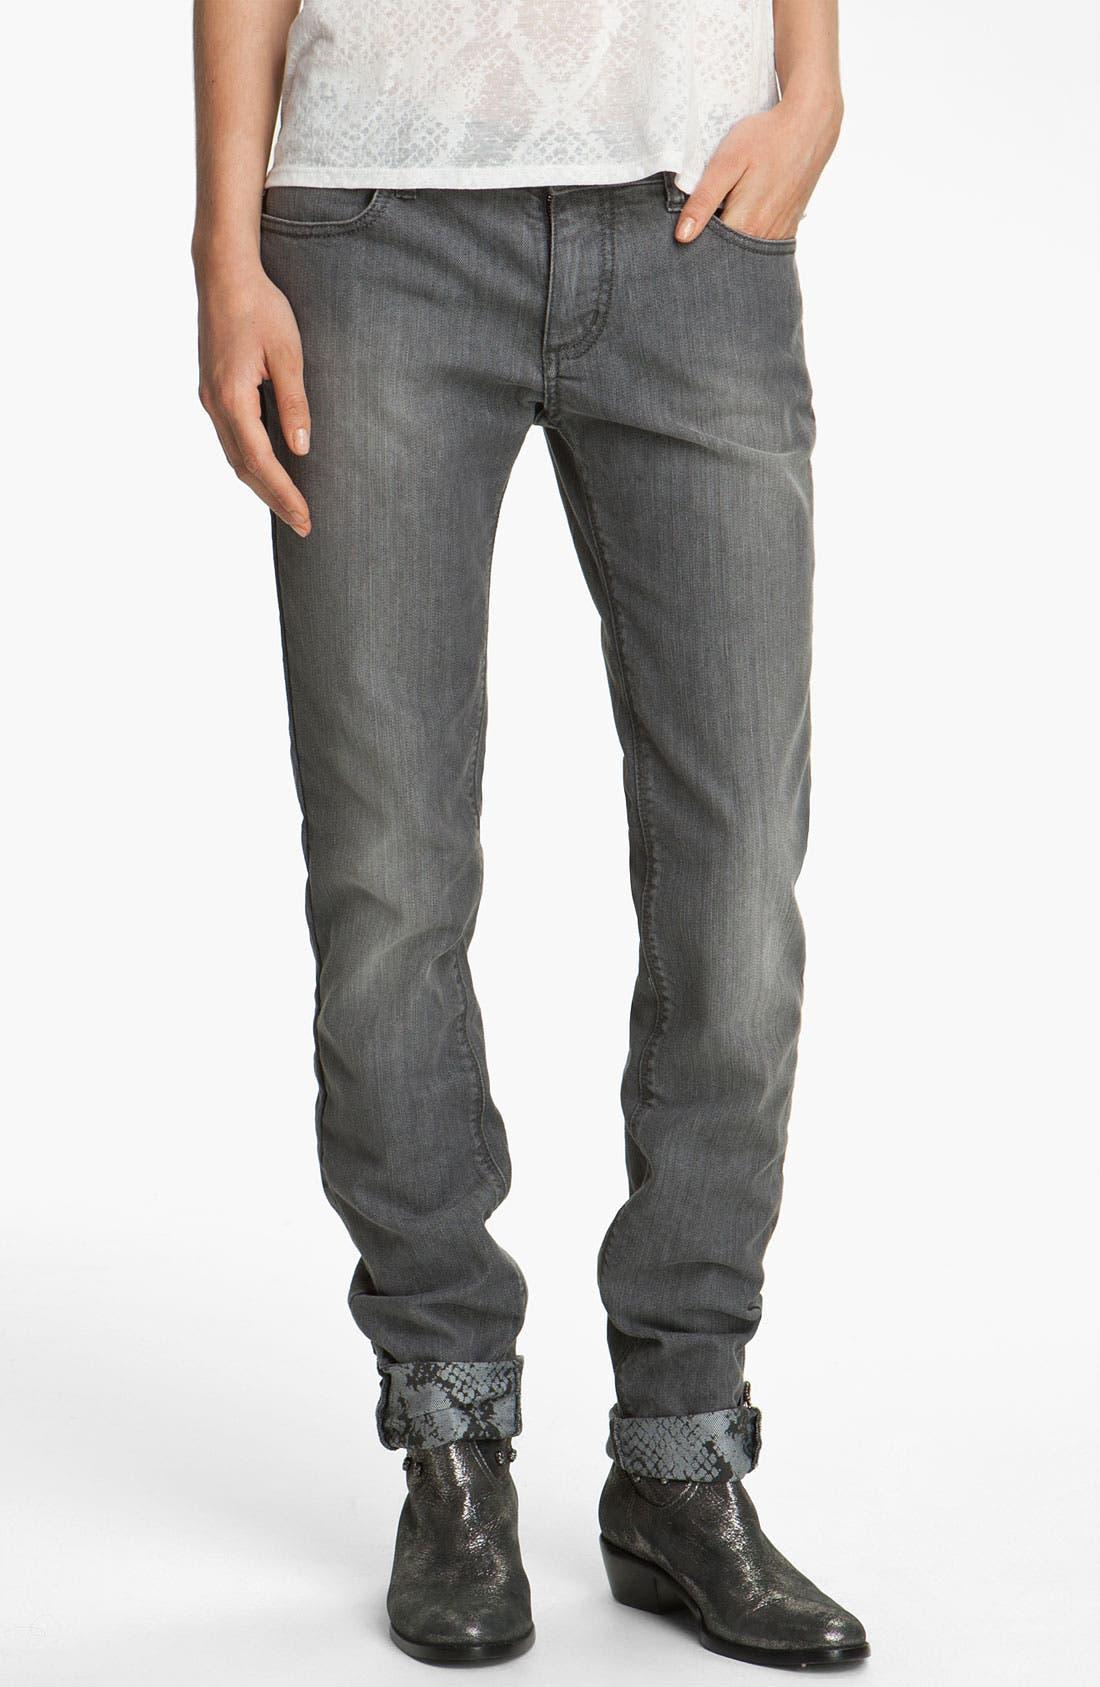 Alternate Image 1 Selected - Zadig & Voltaire 'Eva' Skinny Jeans